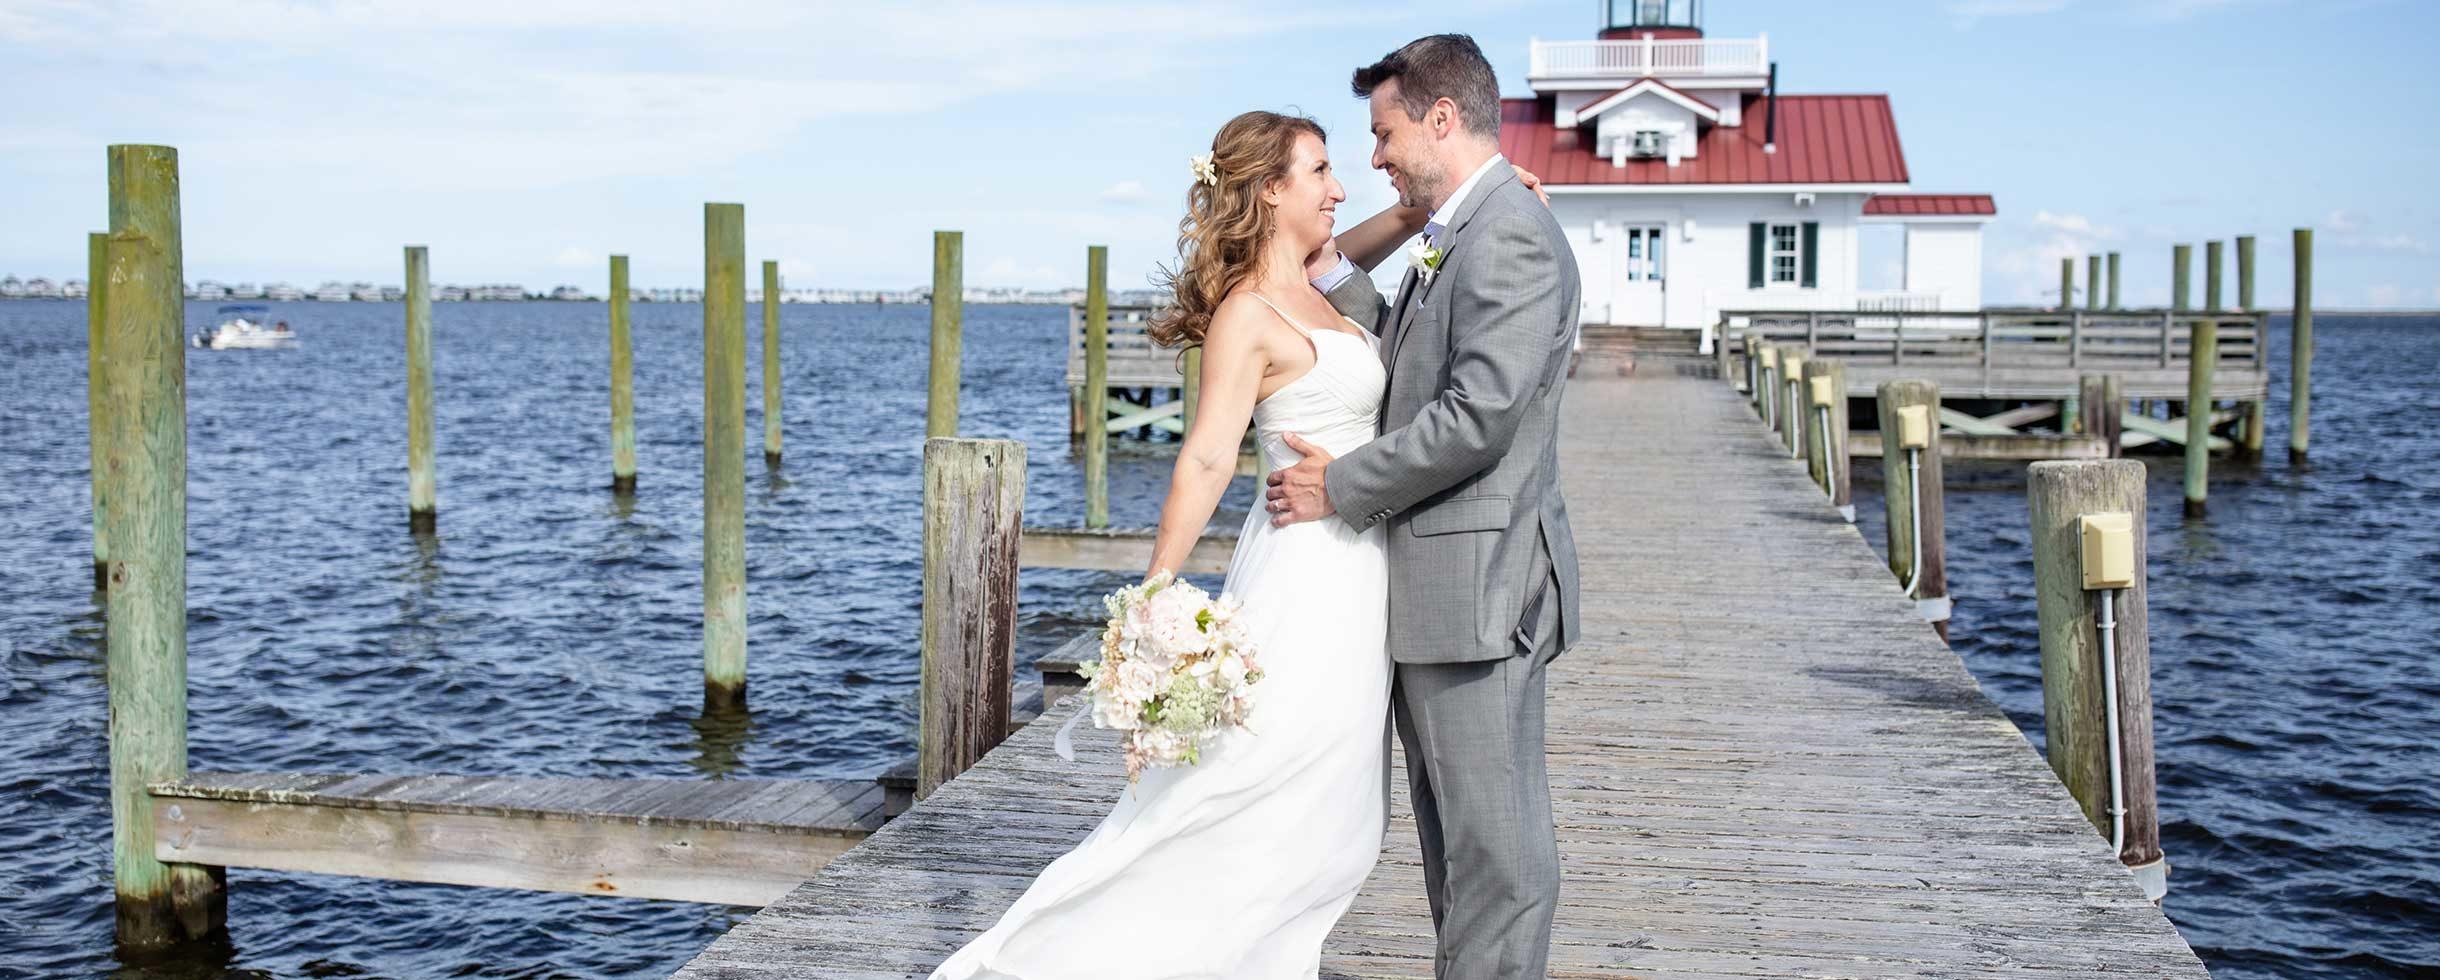 Coastal Wedding Package at White Doe Inn